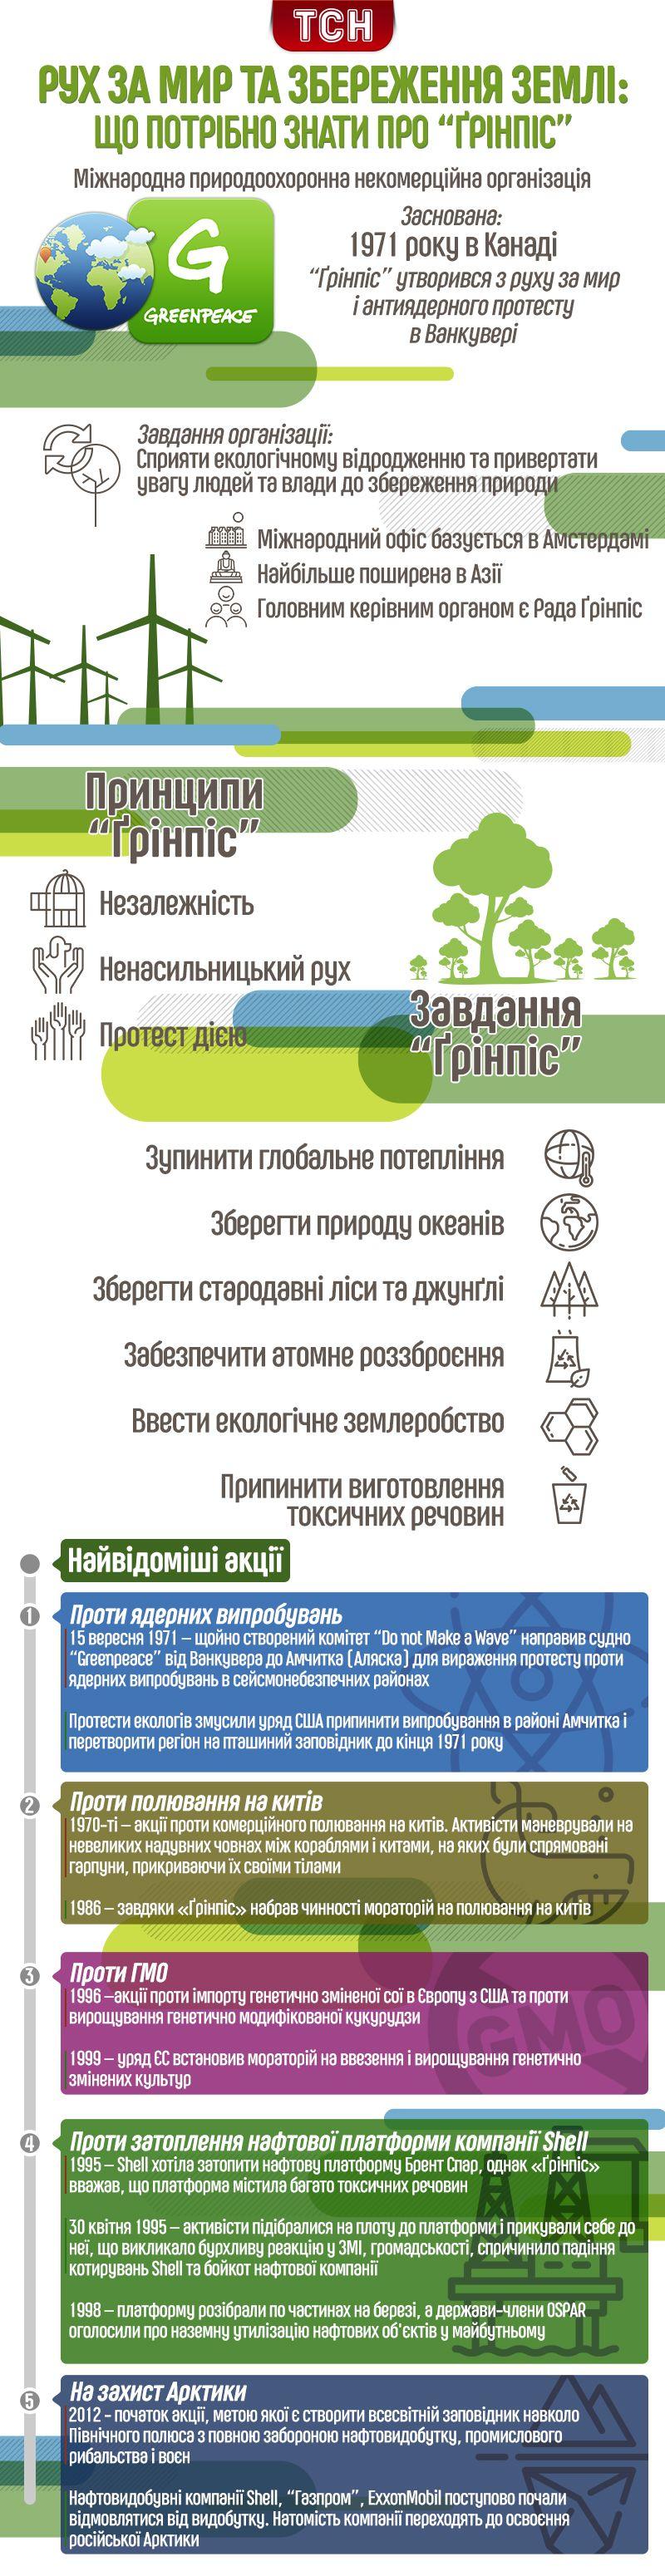 Грінпіс, інфографіка